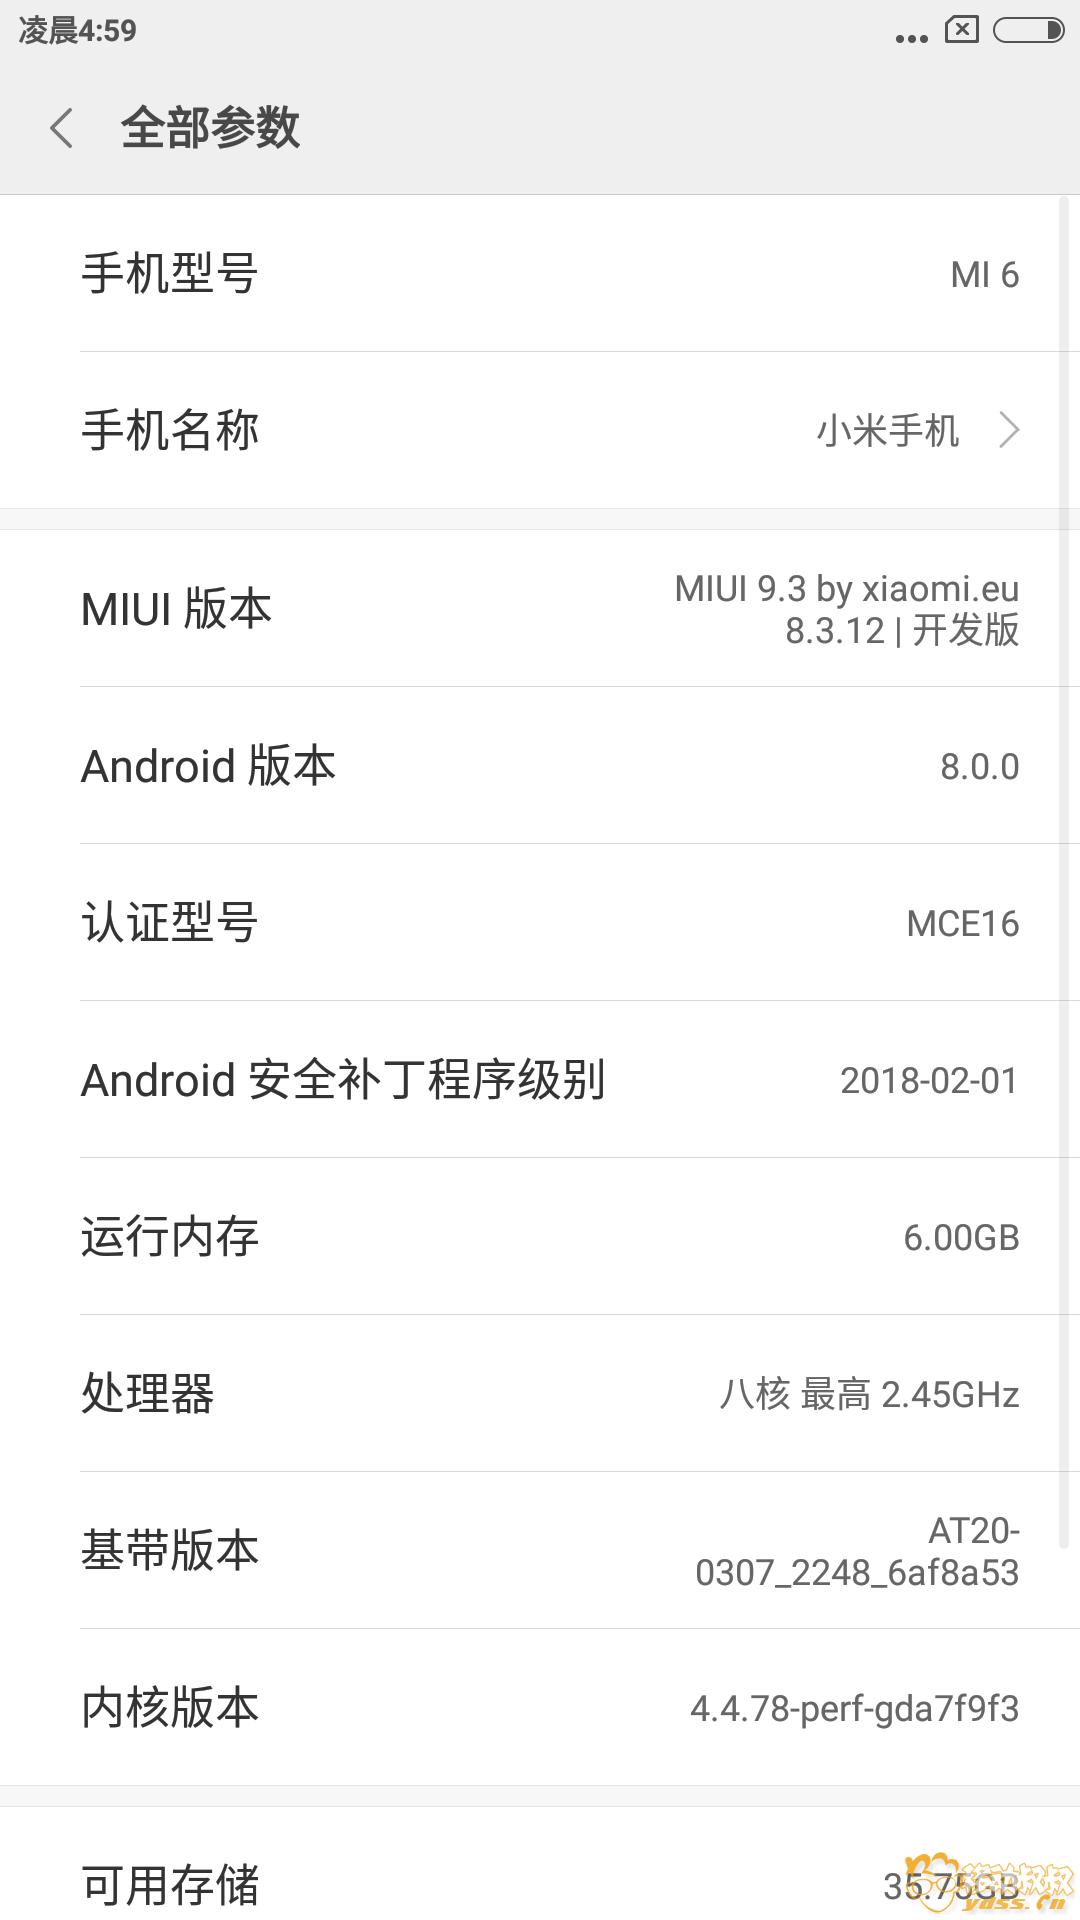 Screenshot_2018-03-12-04-59-58-006_com.android.settings.png